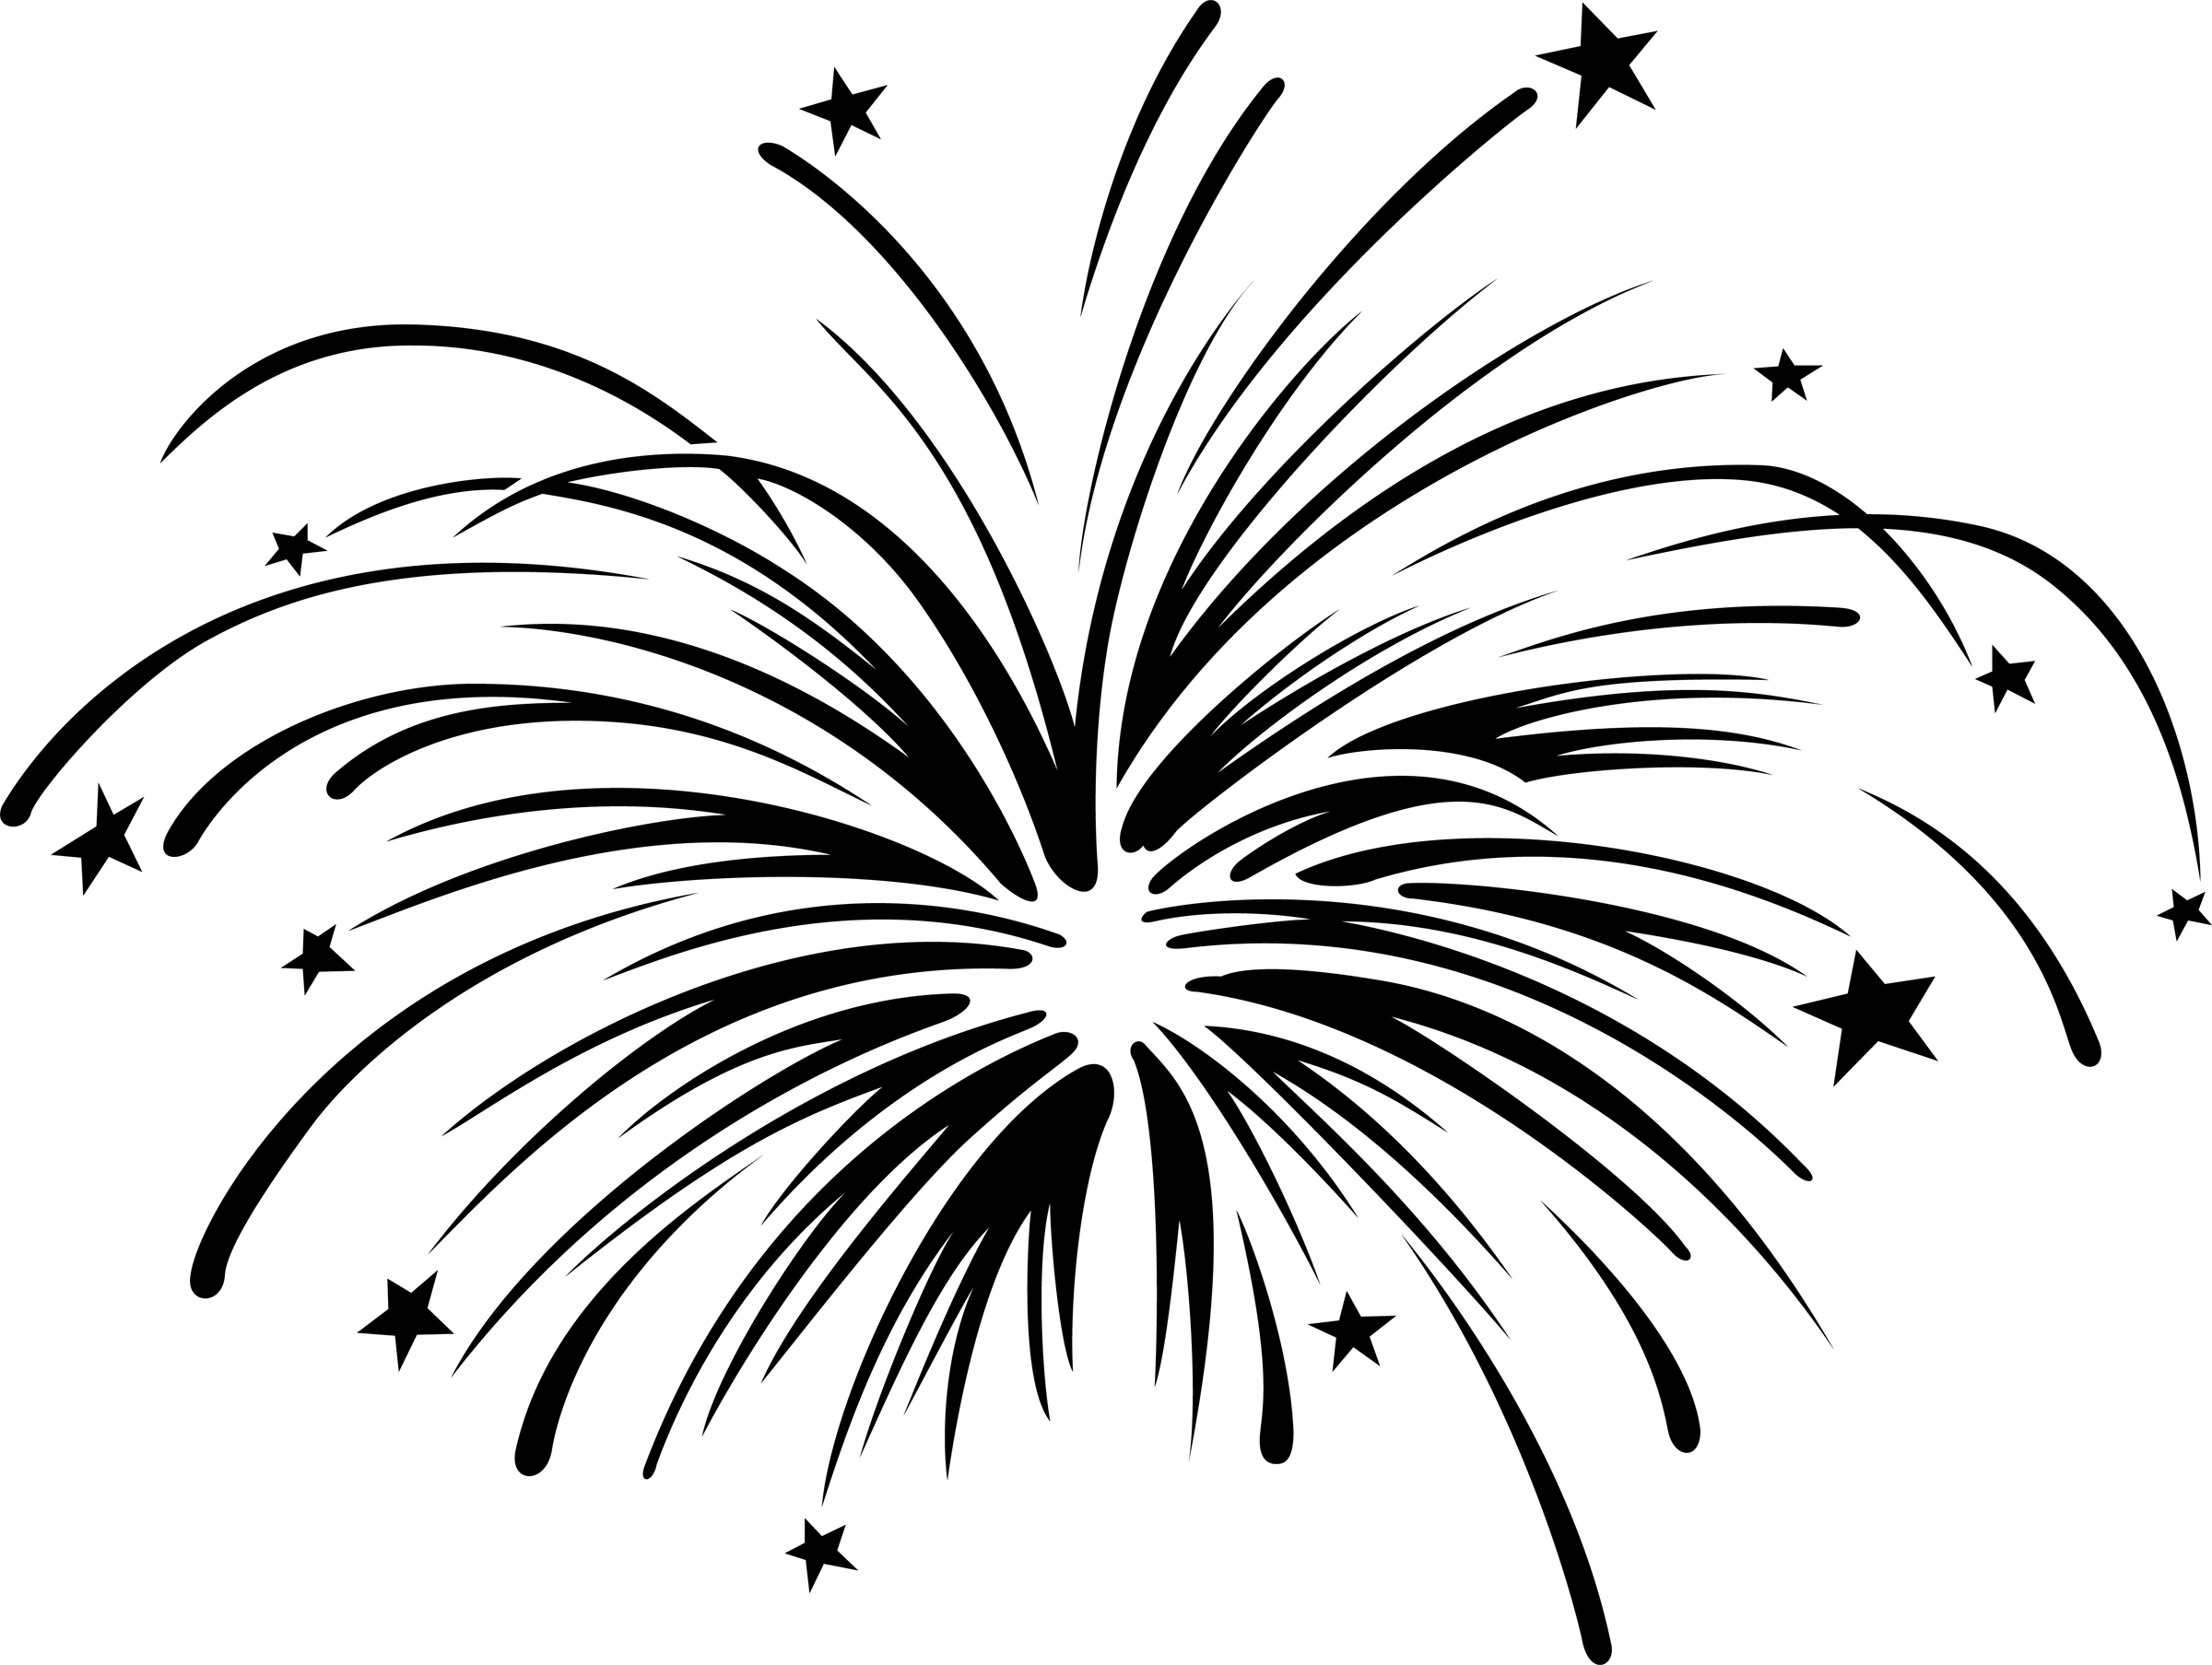 Fireworks black and white clipart banner library Fireworks clipart black and white free - ClipartAndScrap banner library